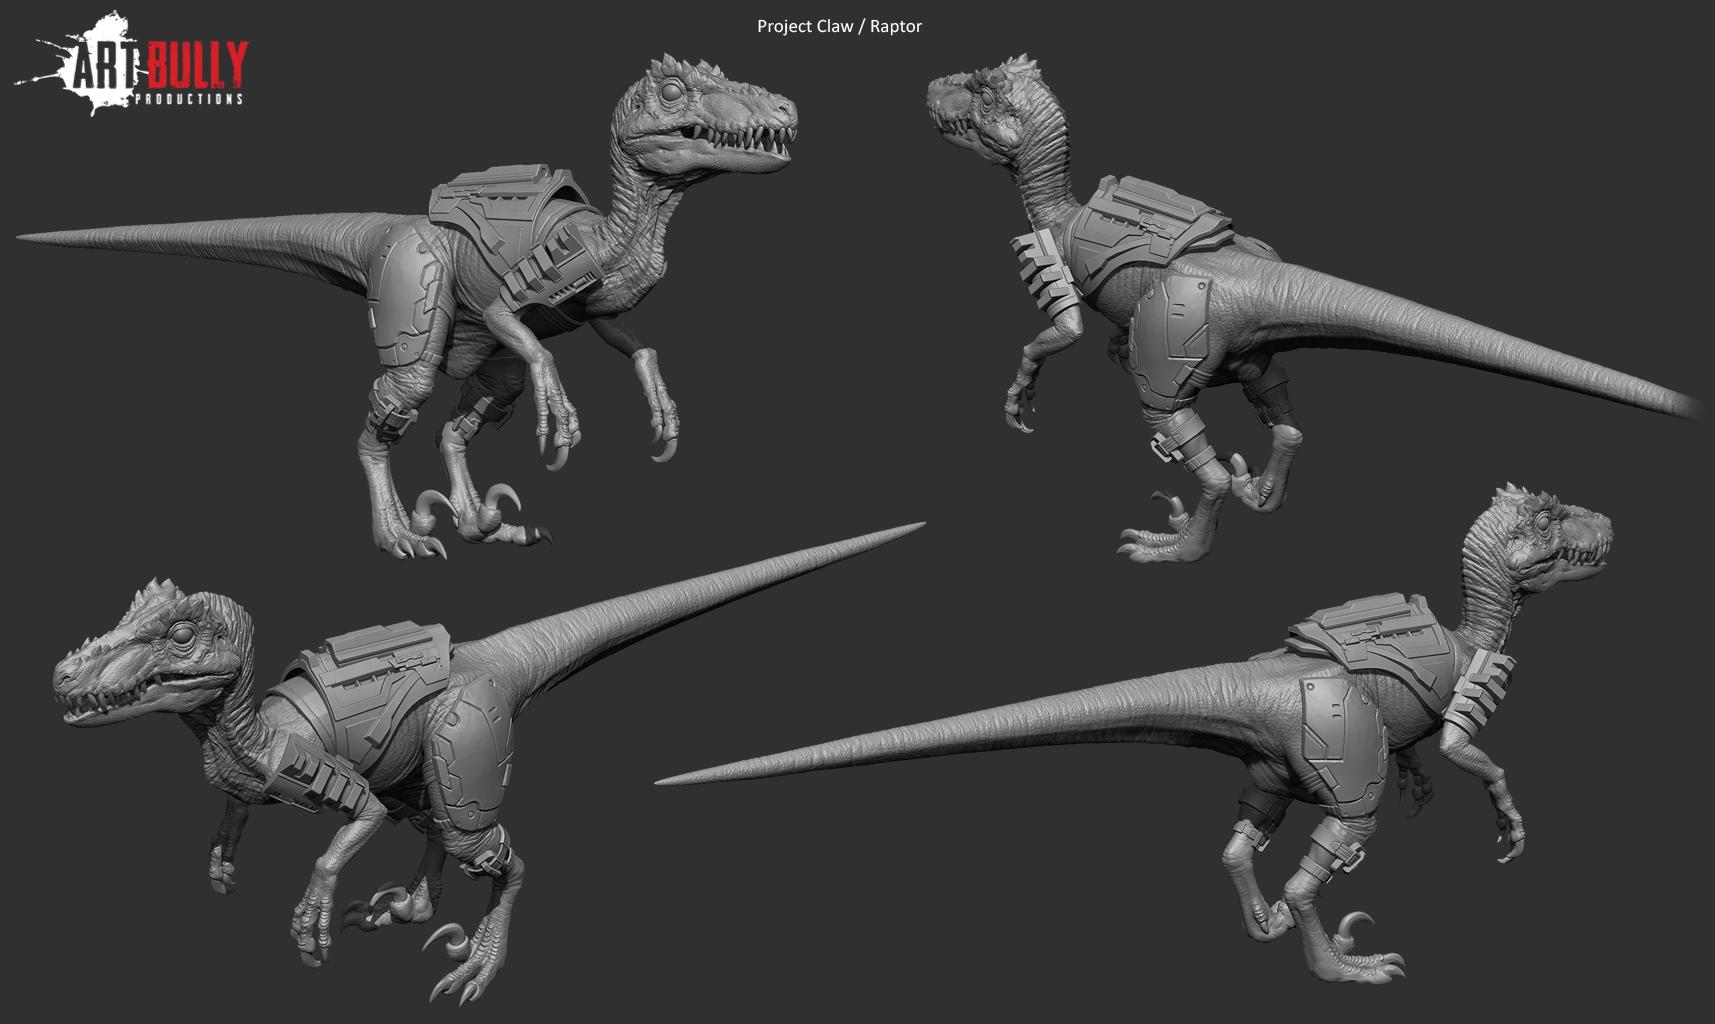 Raptor_Zbrush_Render_01.jpg